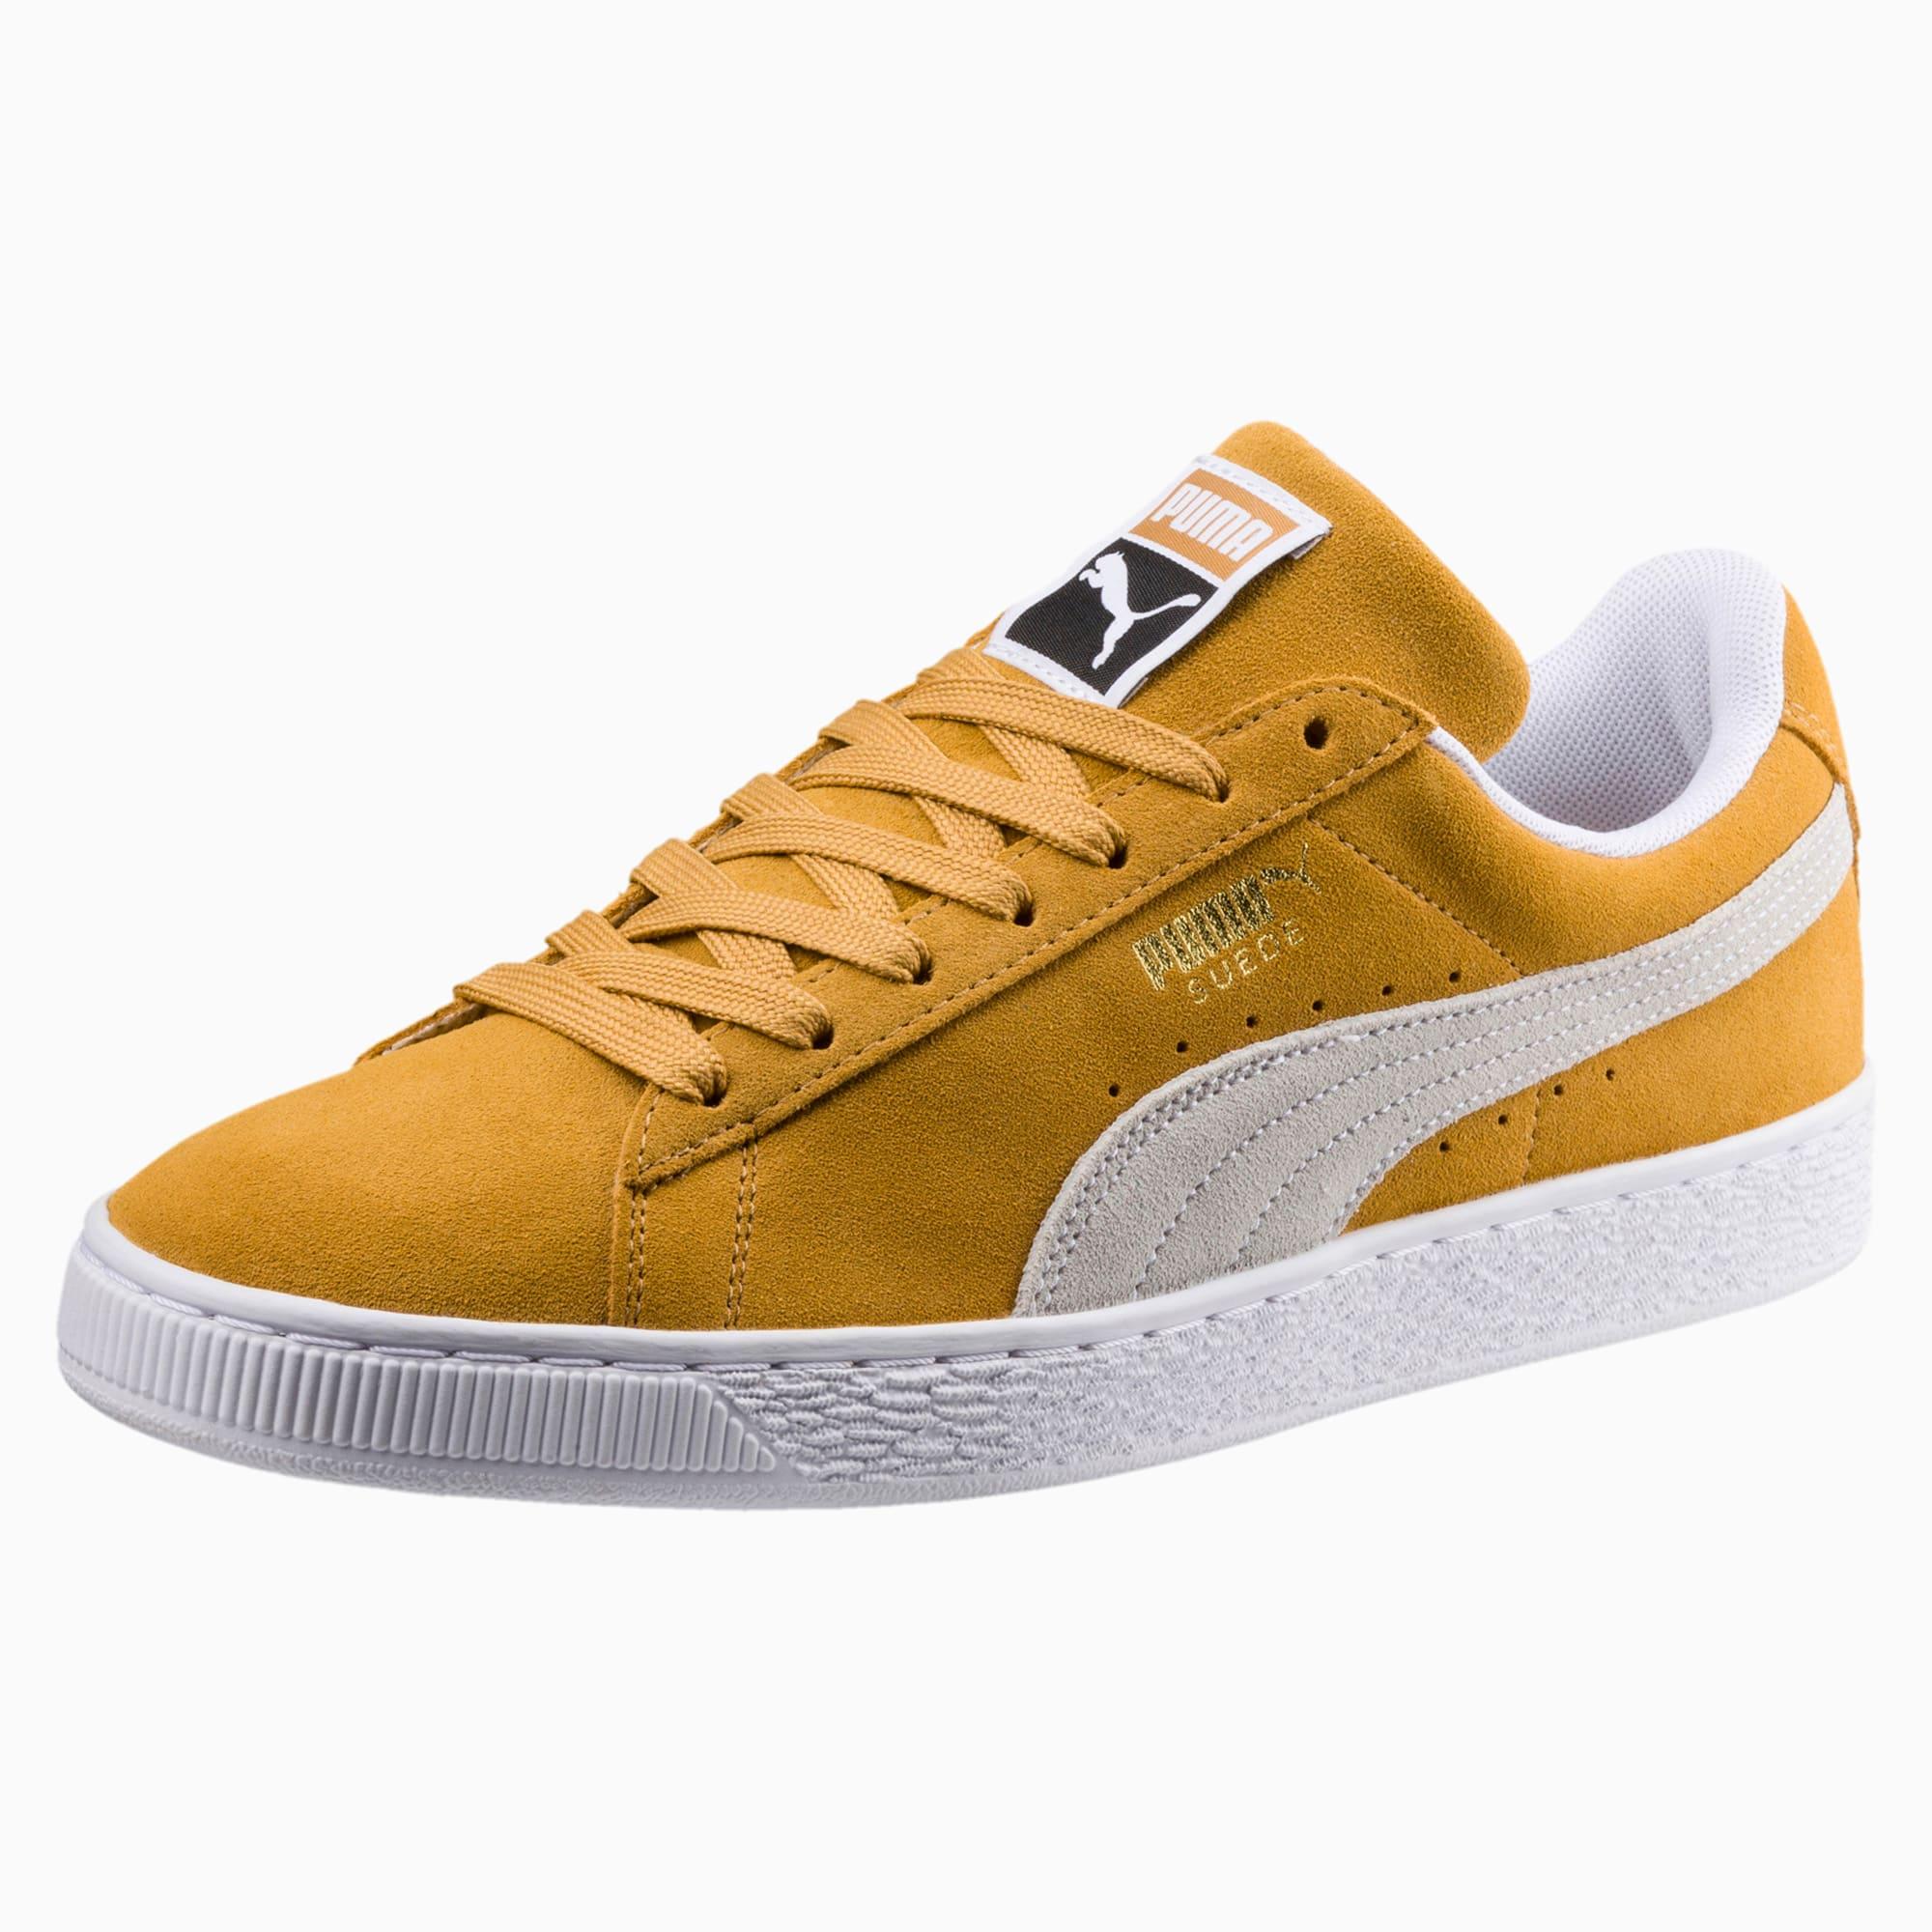 Continuo de acuerdo a Inscribirse  Suede Classic Trainers | PUMA Sneakers | PUMA